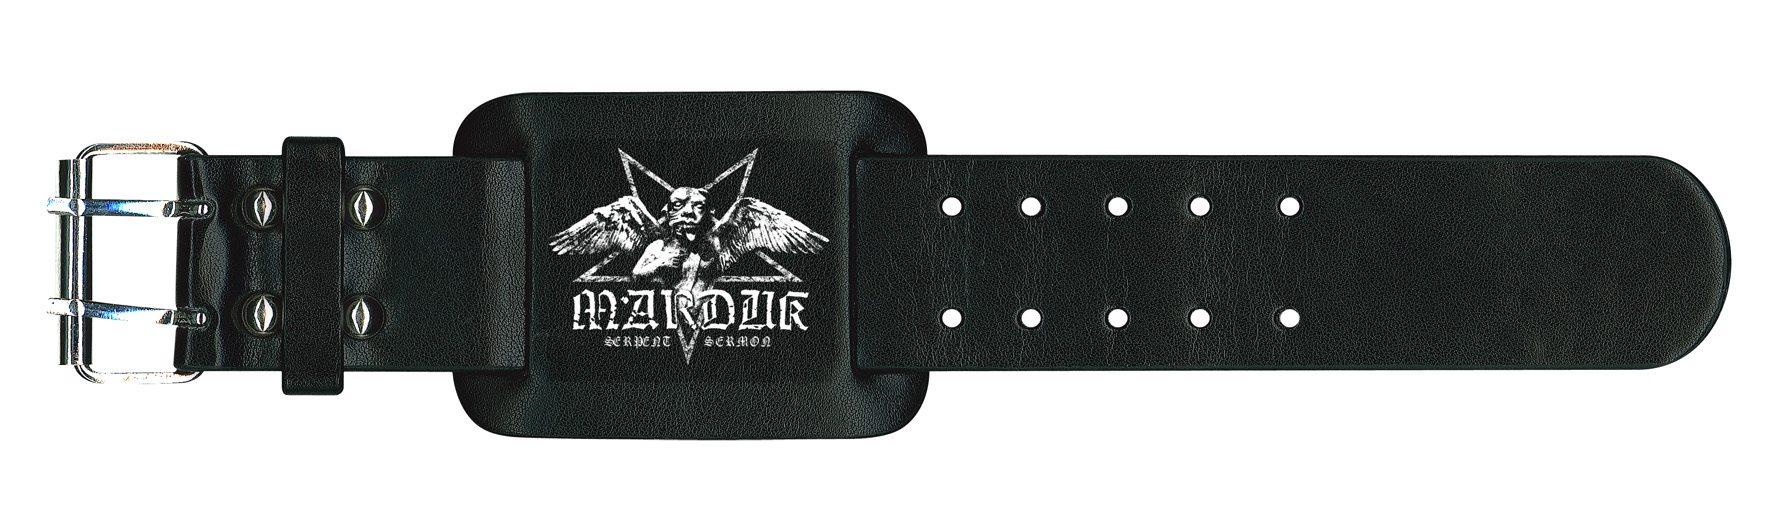 Marduk Leather Wristband Serpent Sermon